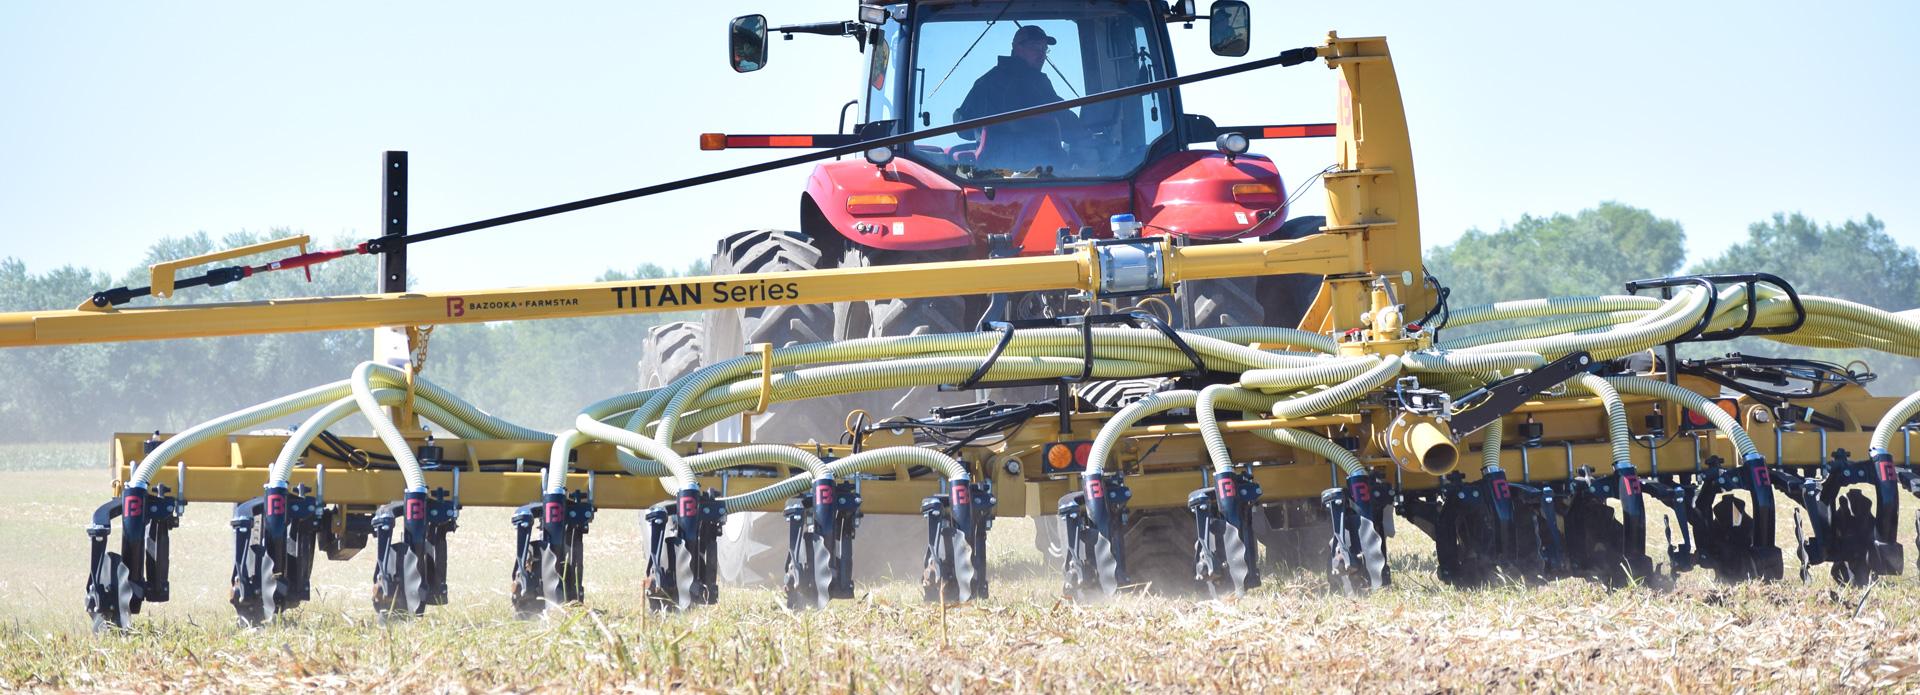 Eldon-C-Stutsman-Inc-Bazooka-Farmstar-Titan-Series-Manure-Toolbar